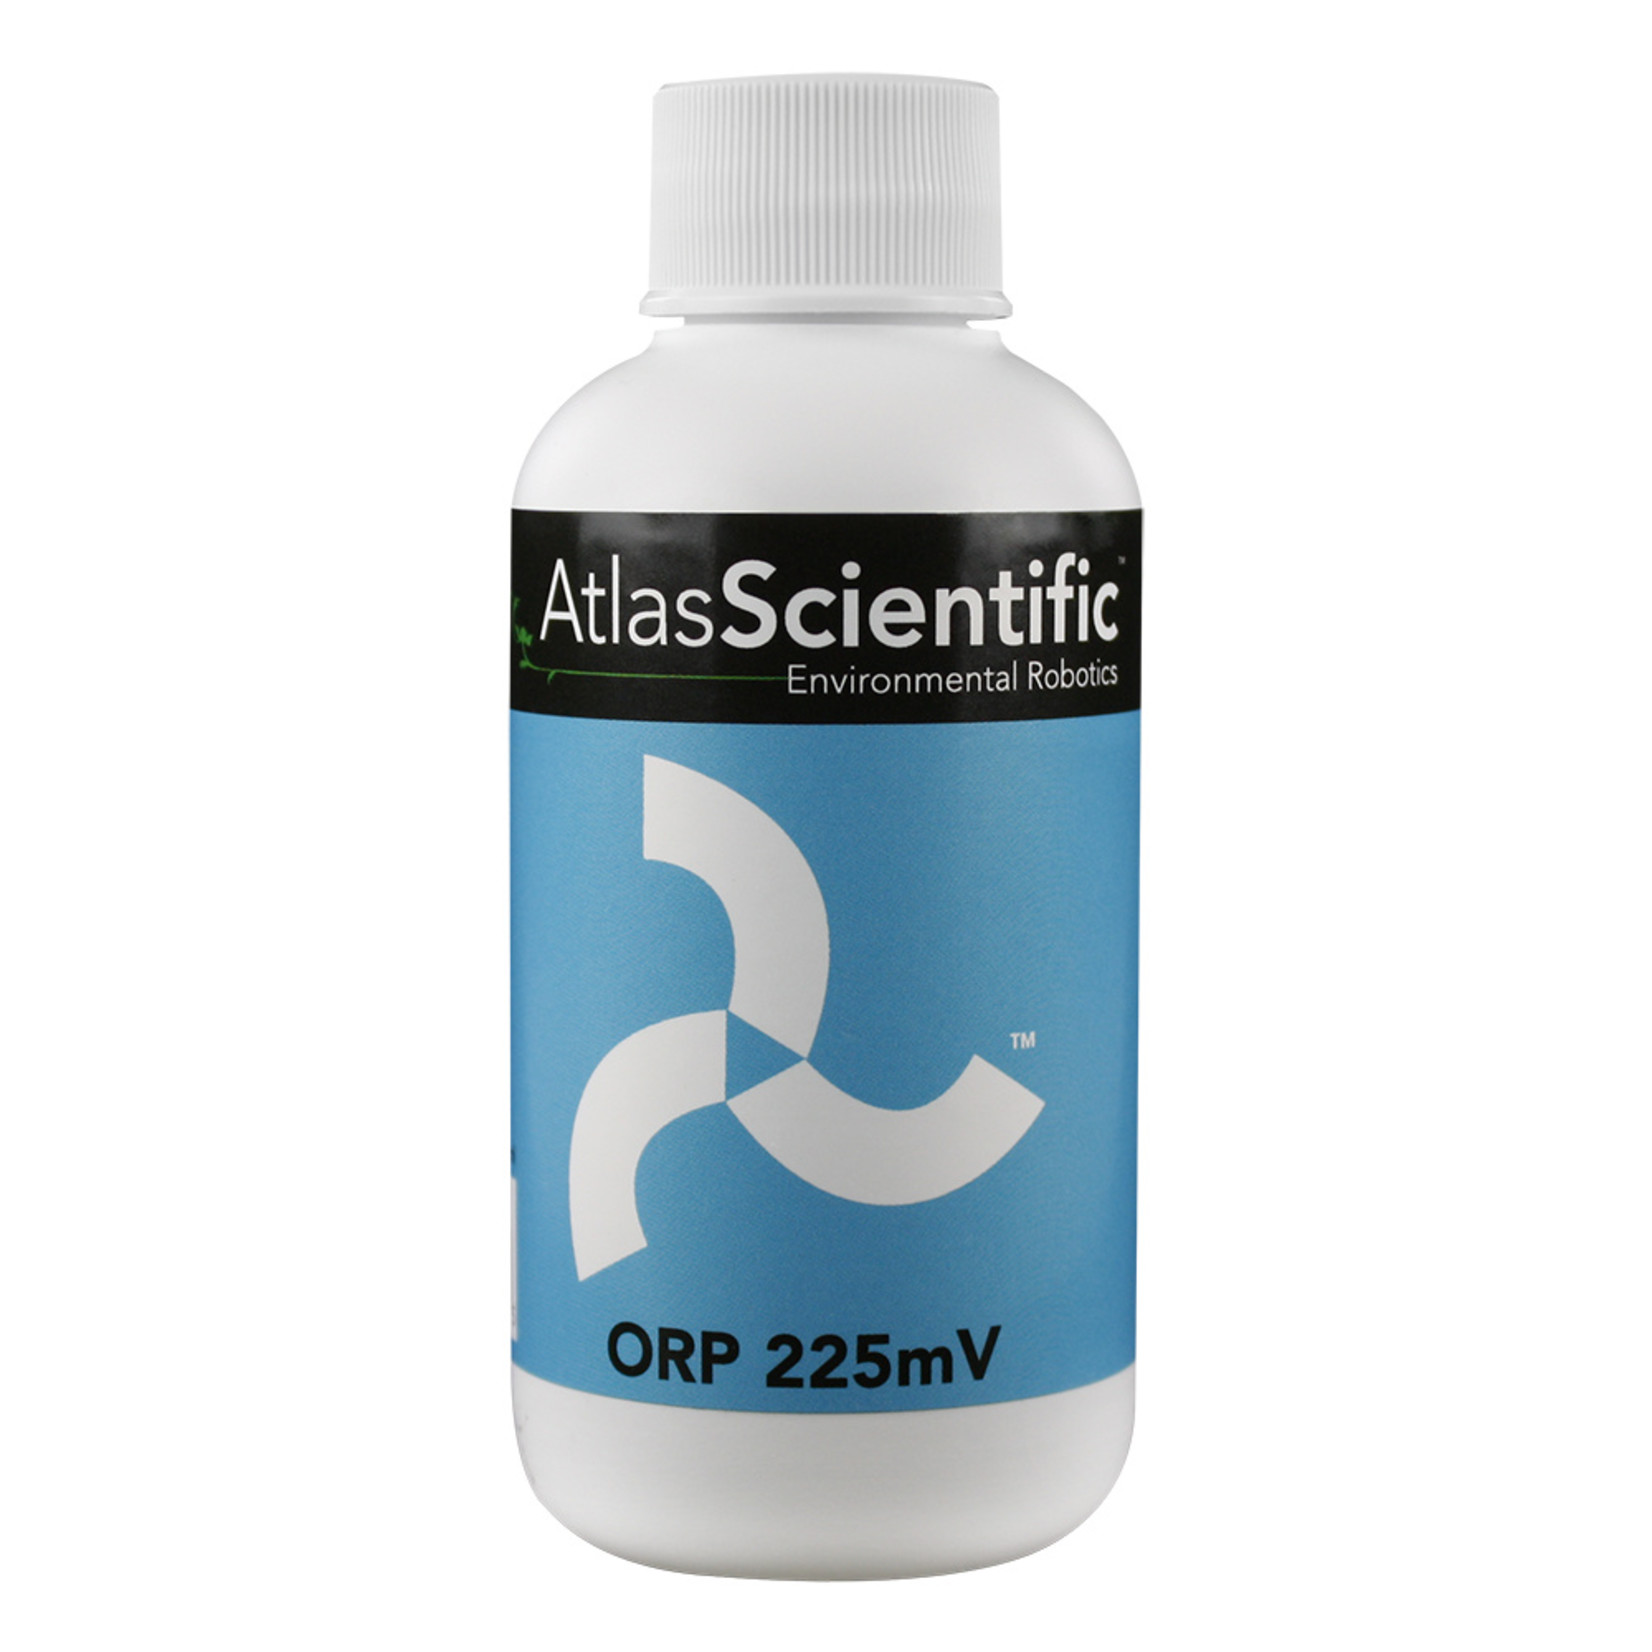 Atlas Scientific ORP 225mV Calibration